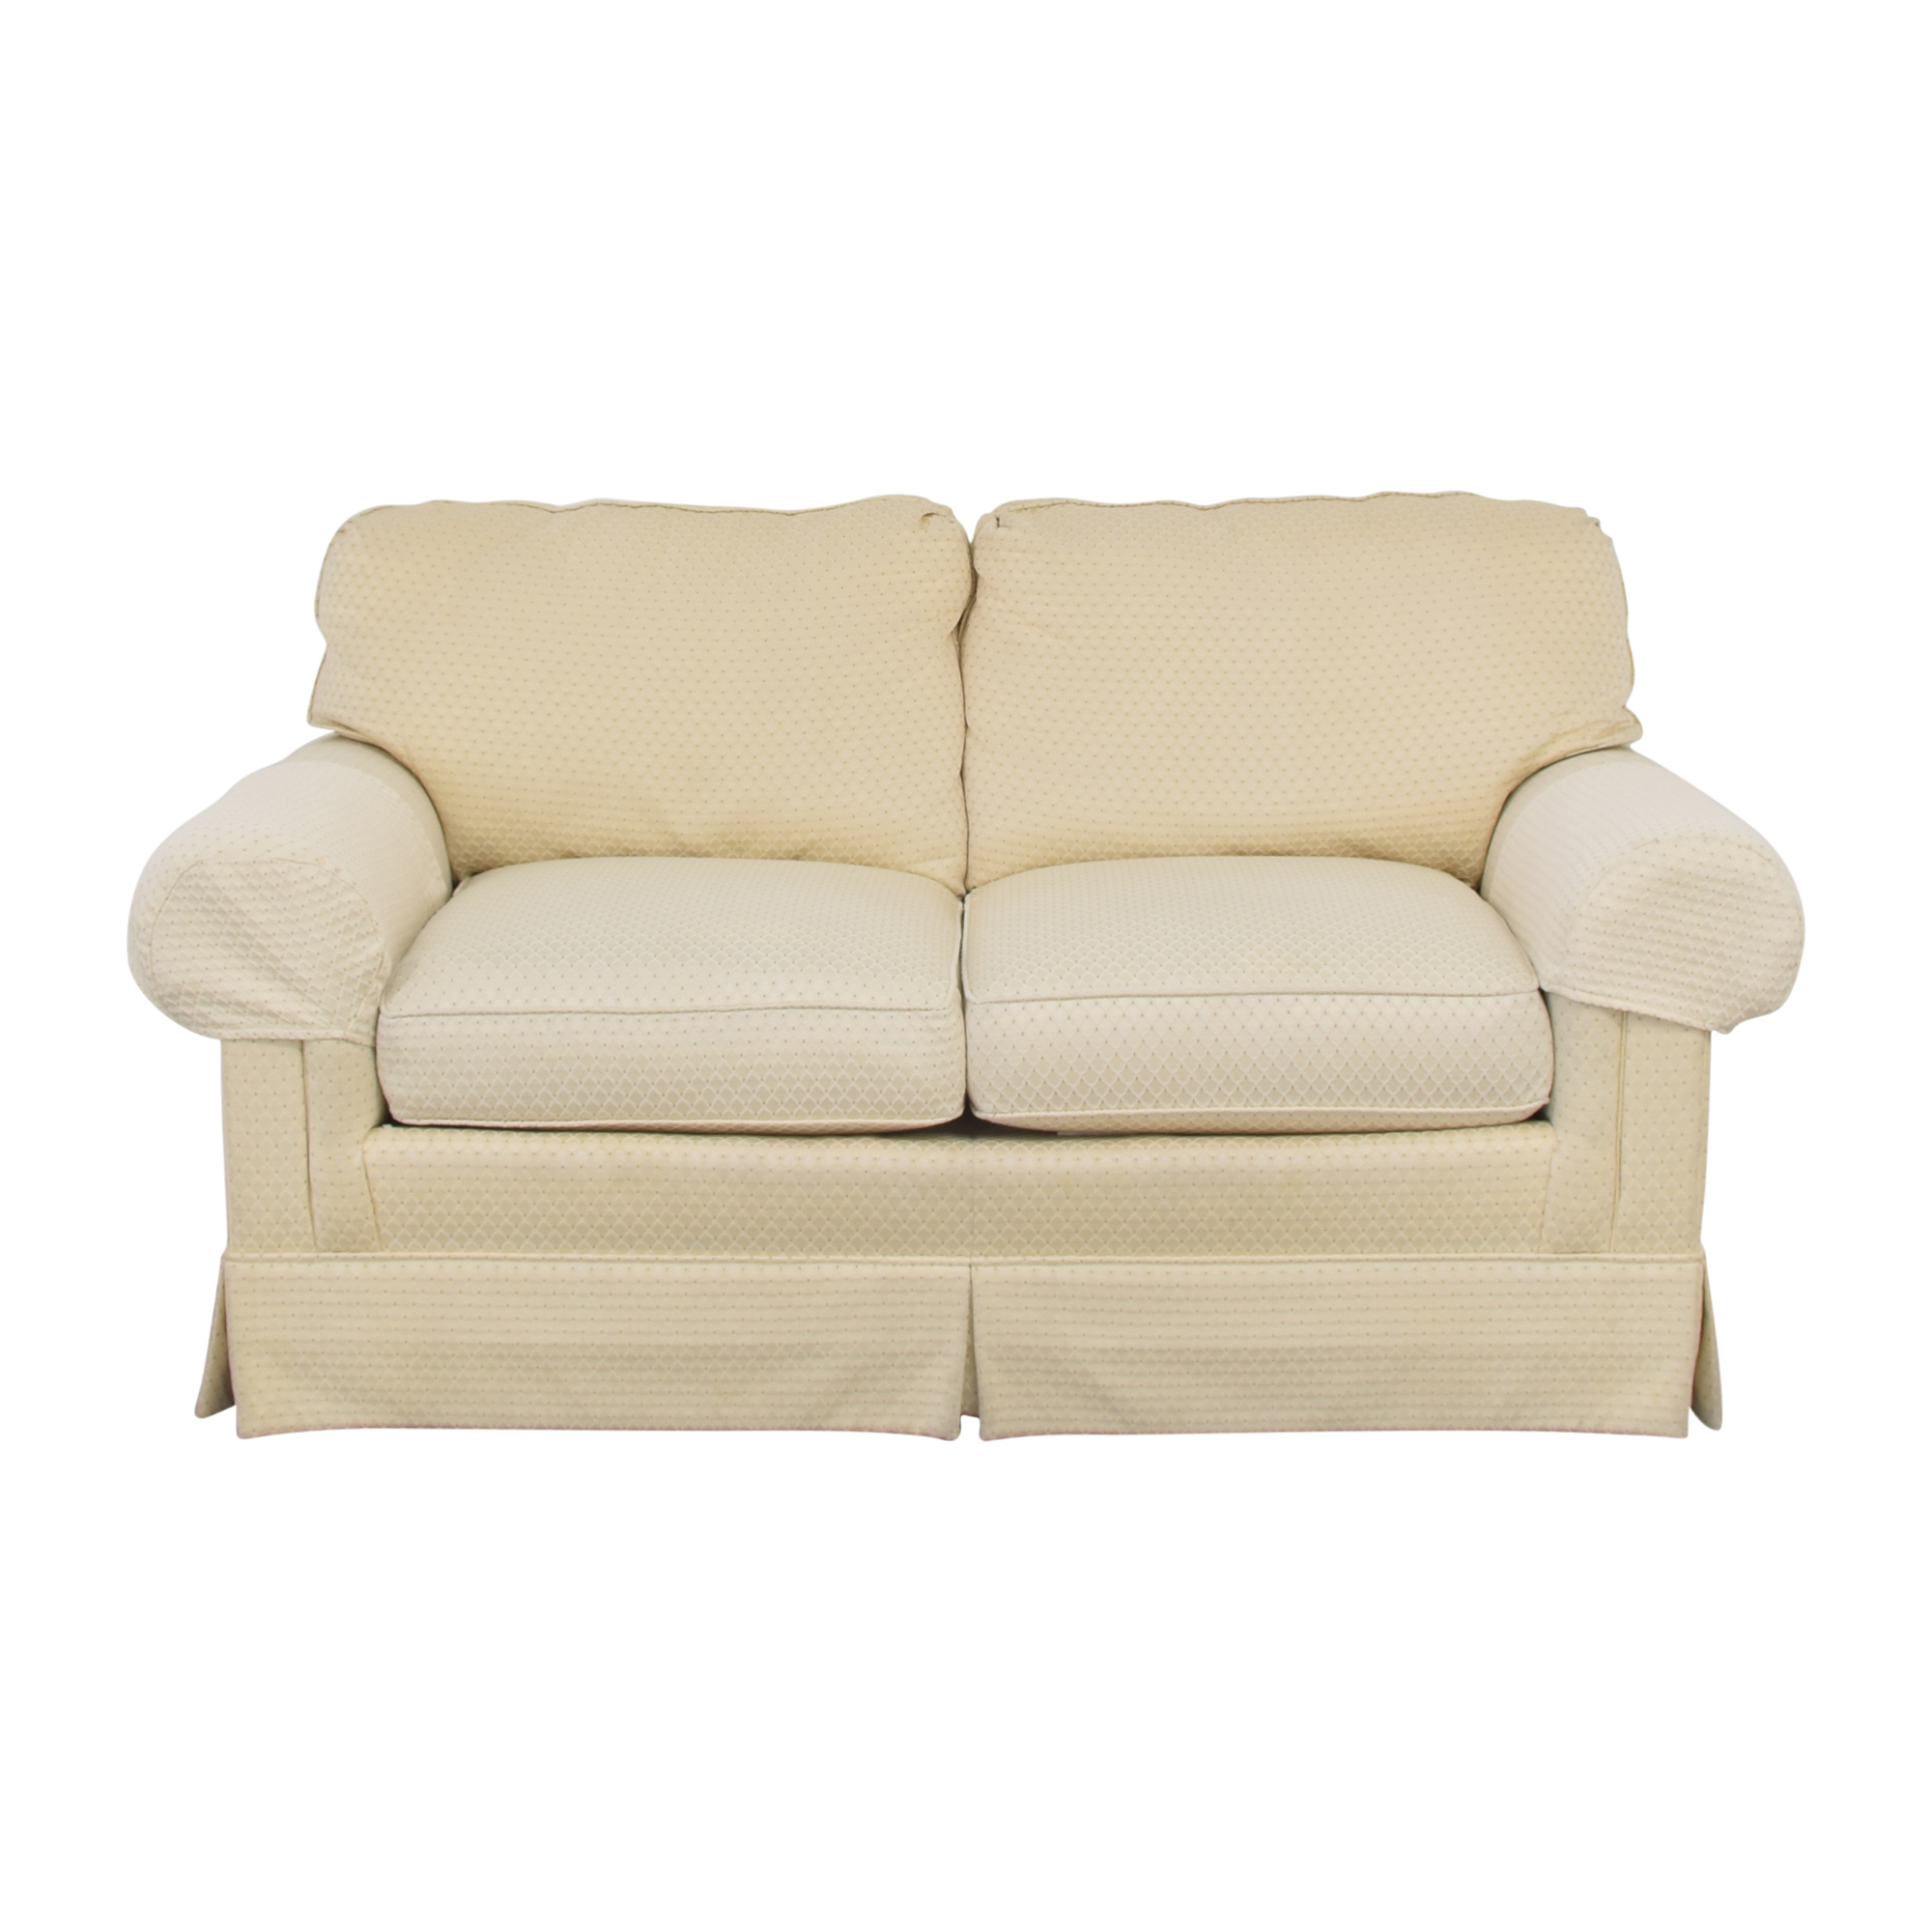 Thomasville Thomasville Two Cushion Loveseat for sale